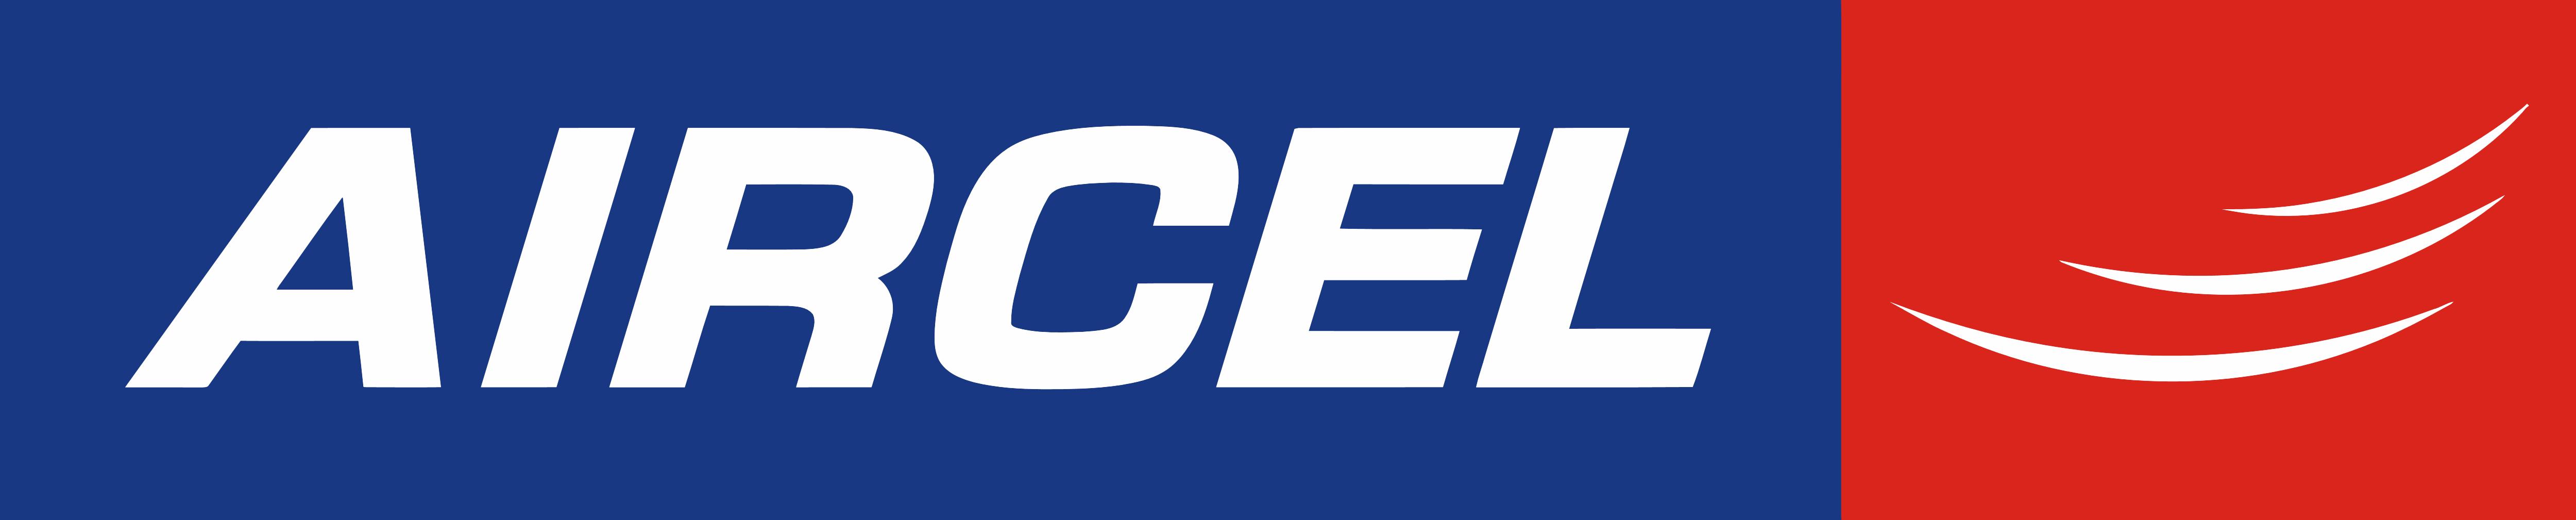 aircel � logos download